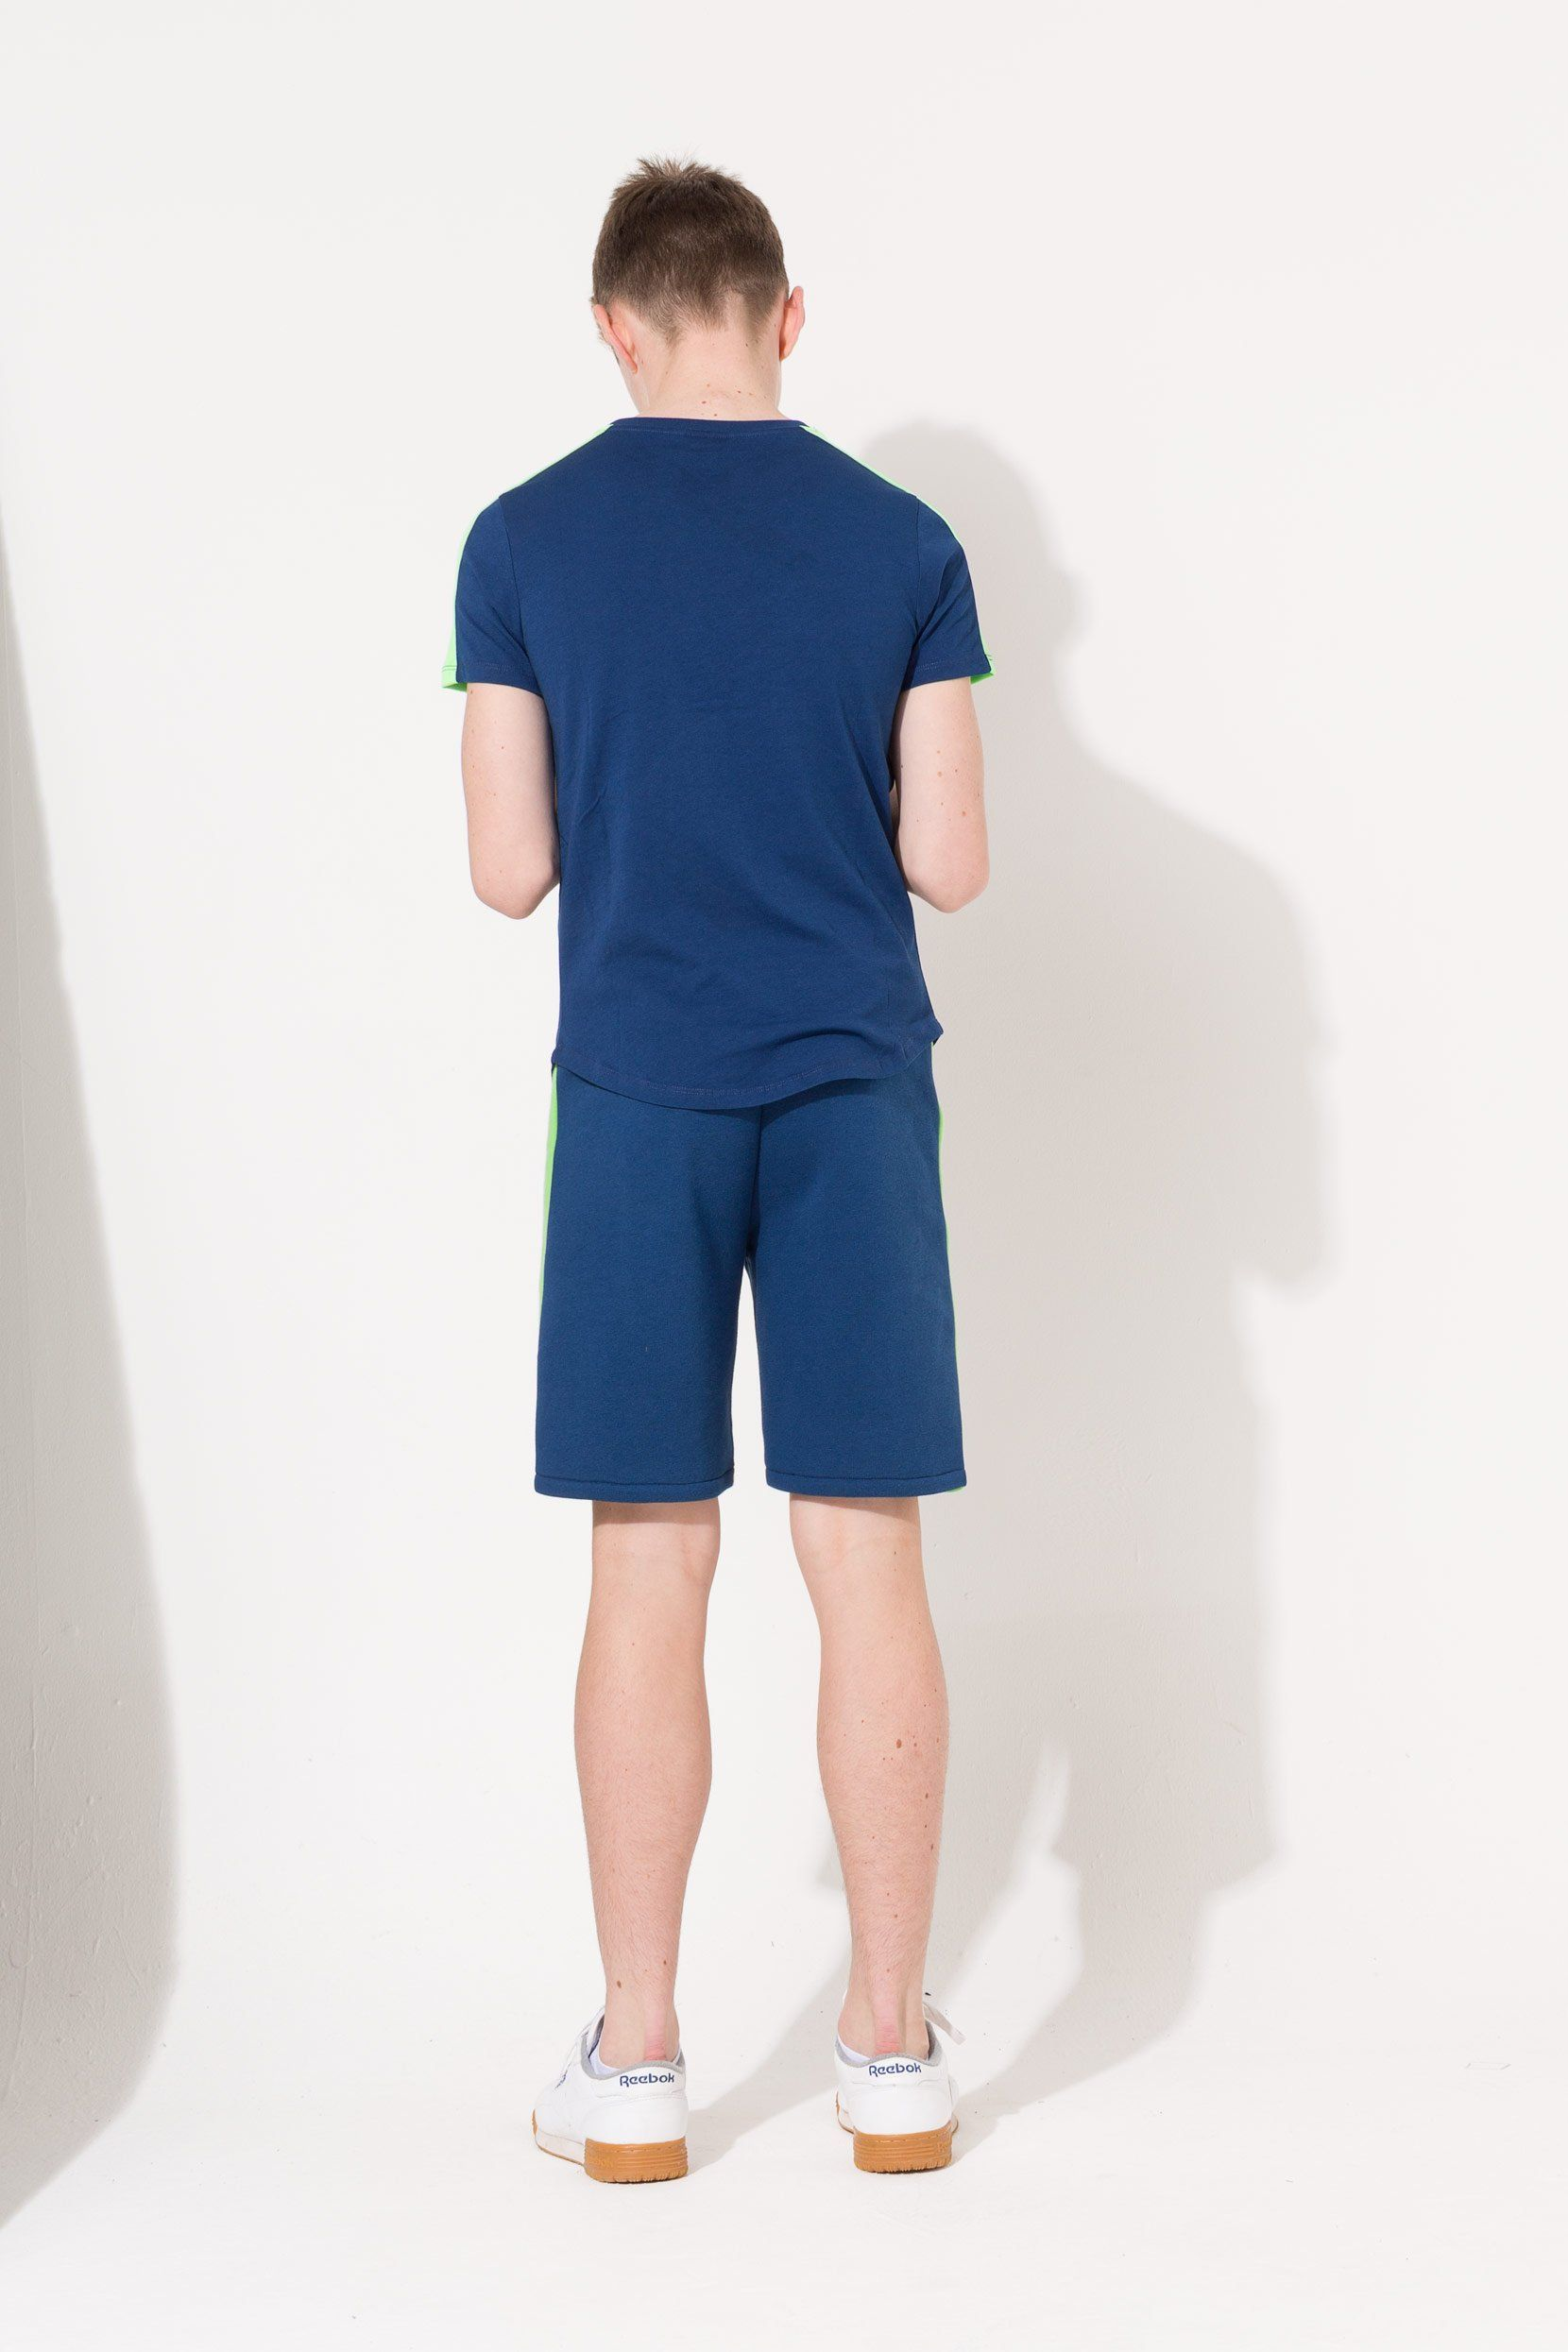 Hype Navy Side Stripe Crest Kids T-Shirt